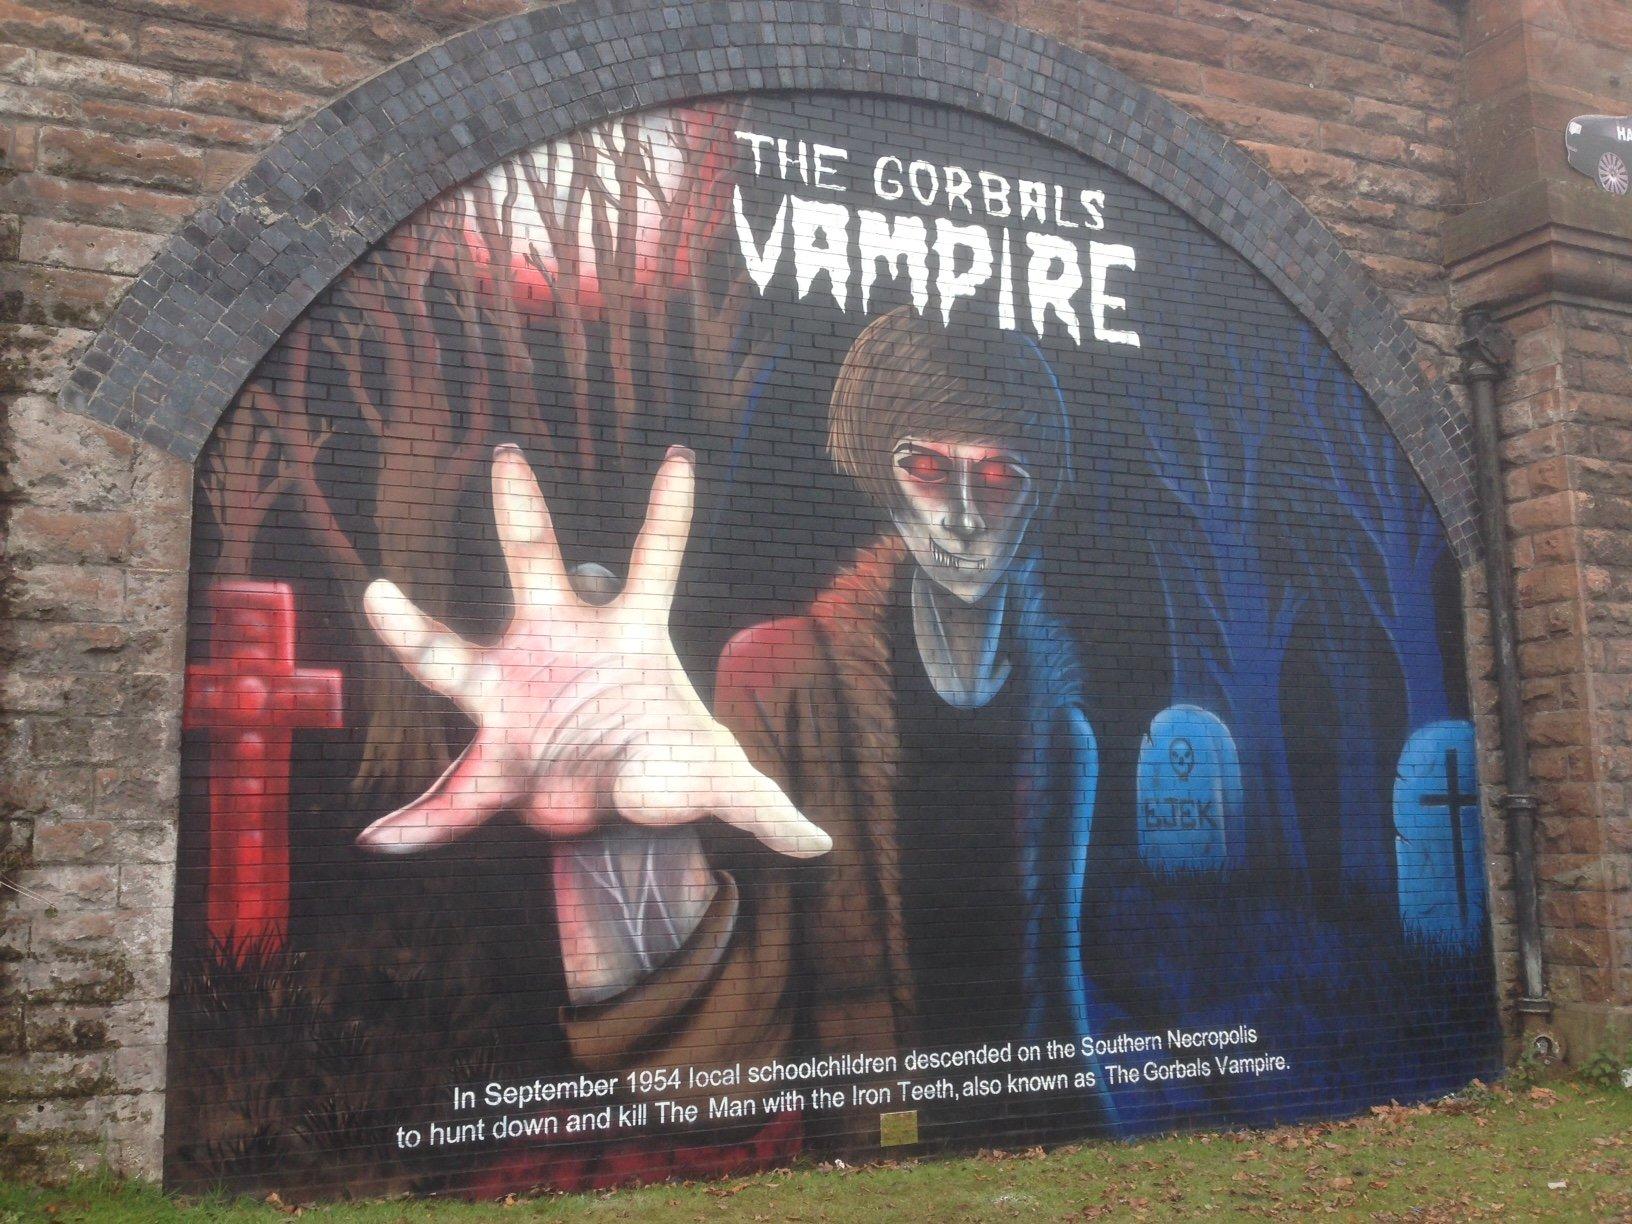 The Gorbals Vampire mural